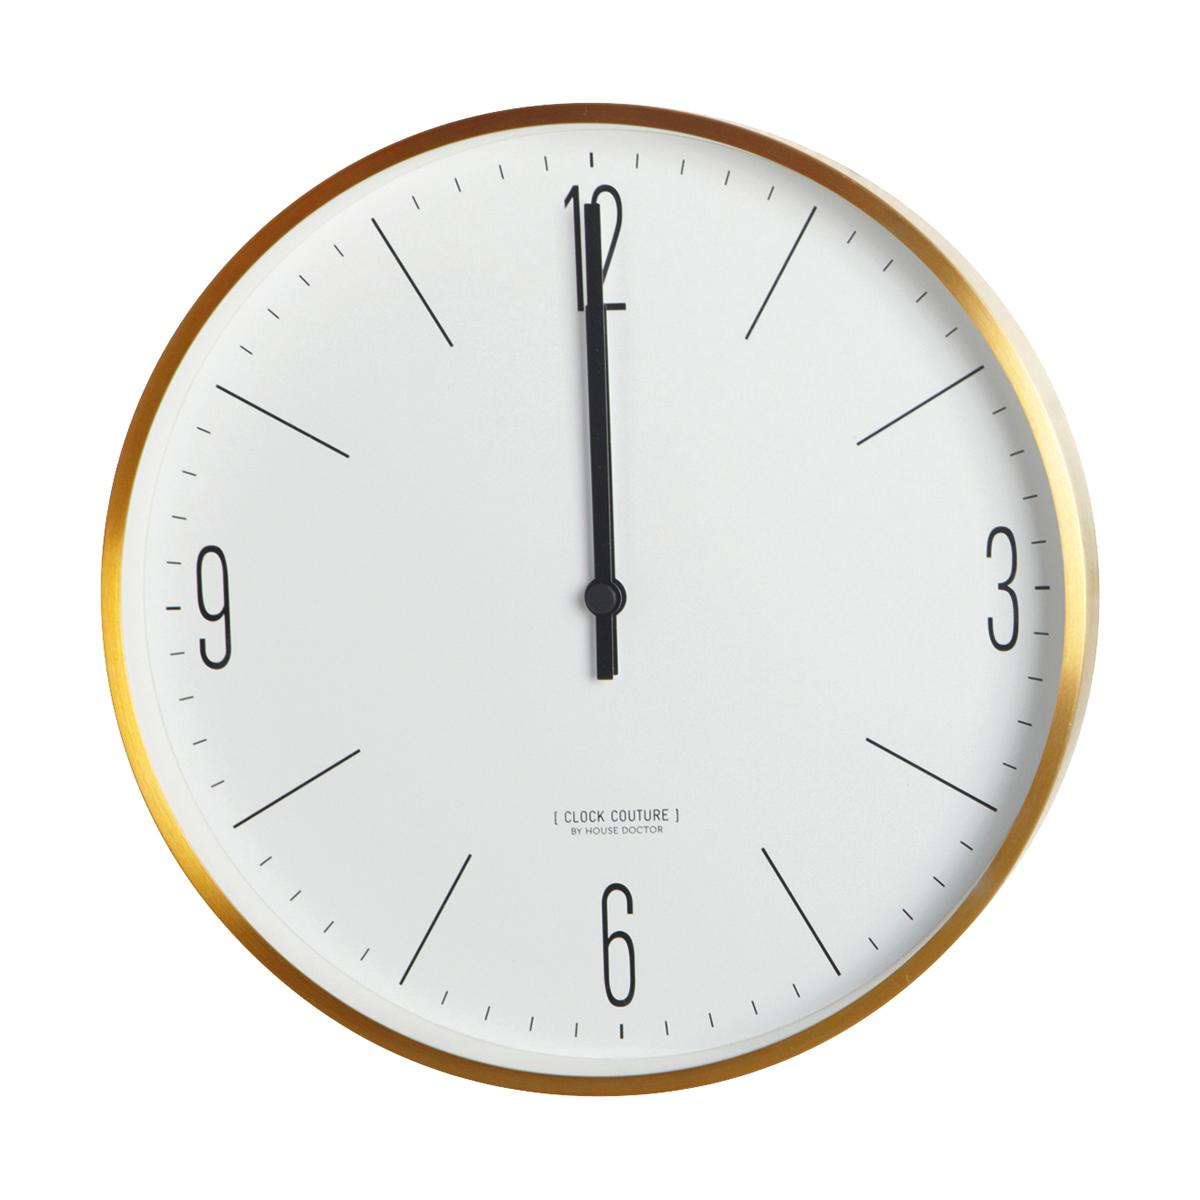 Clock Couture Väggklocka Guld/Vit 30 cm